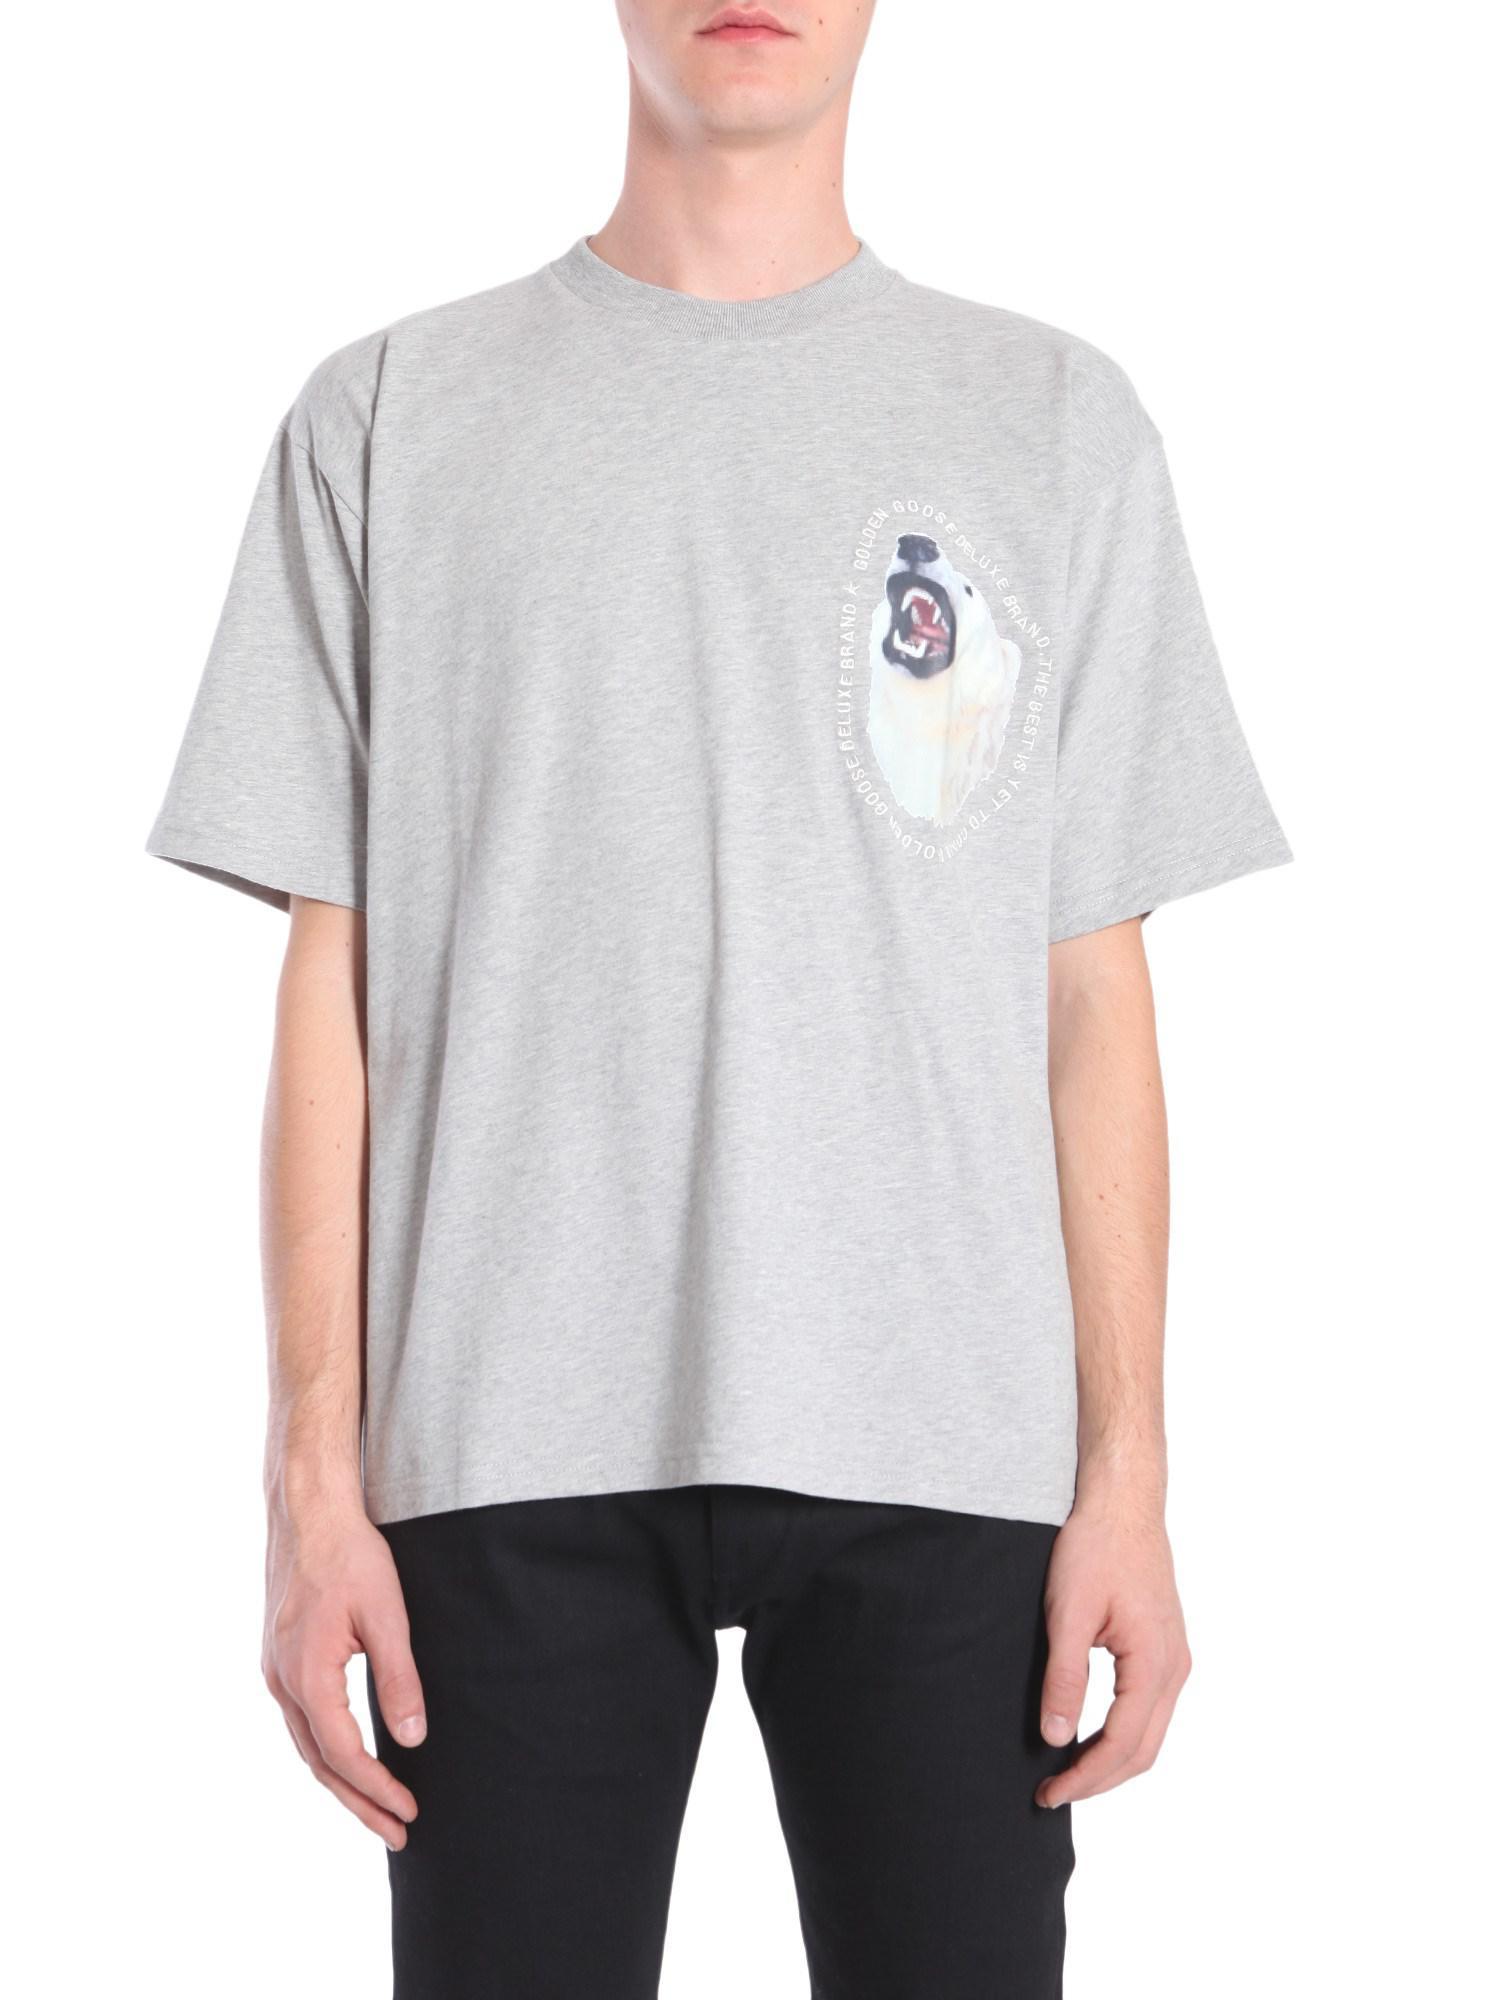 Browse Sale Online High Quality Edward T-shirt - White Golden Goose VvMIL1